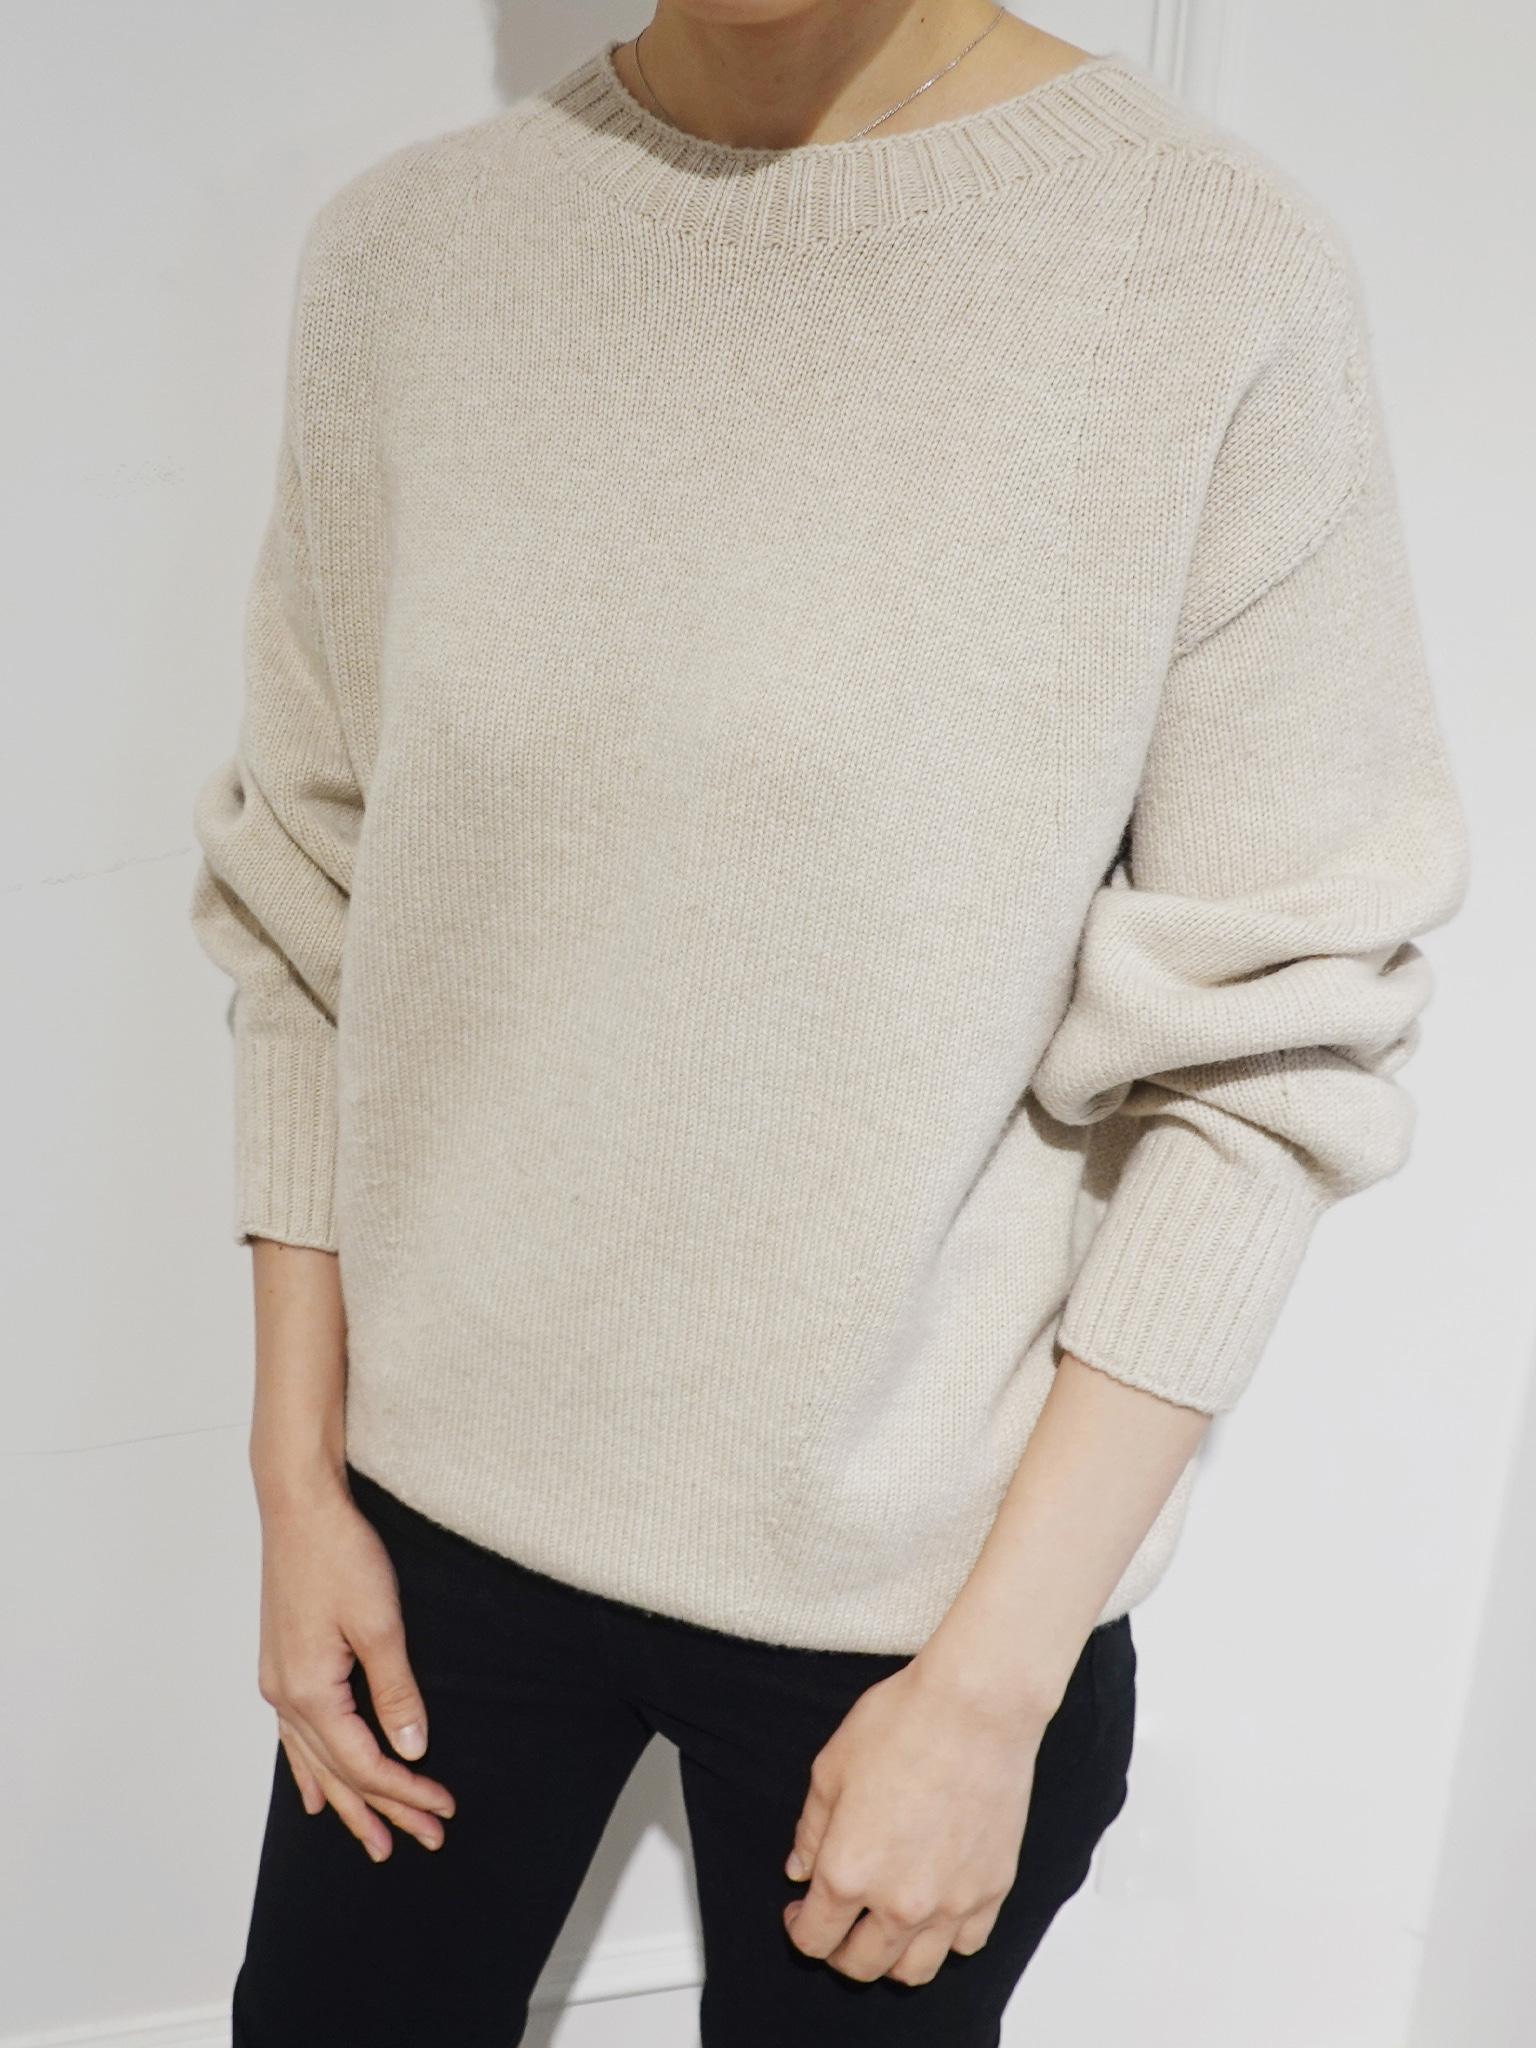 Loropiana Wholegarment Knit Pullover